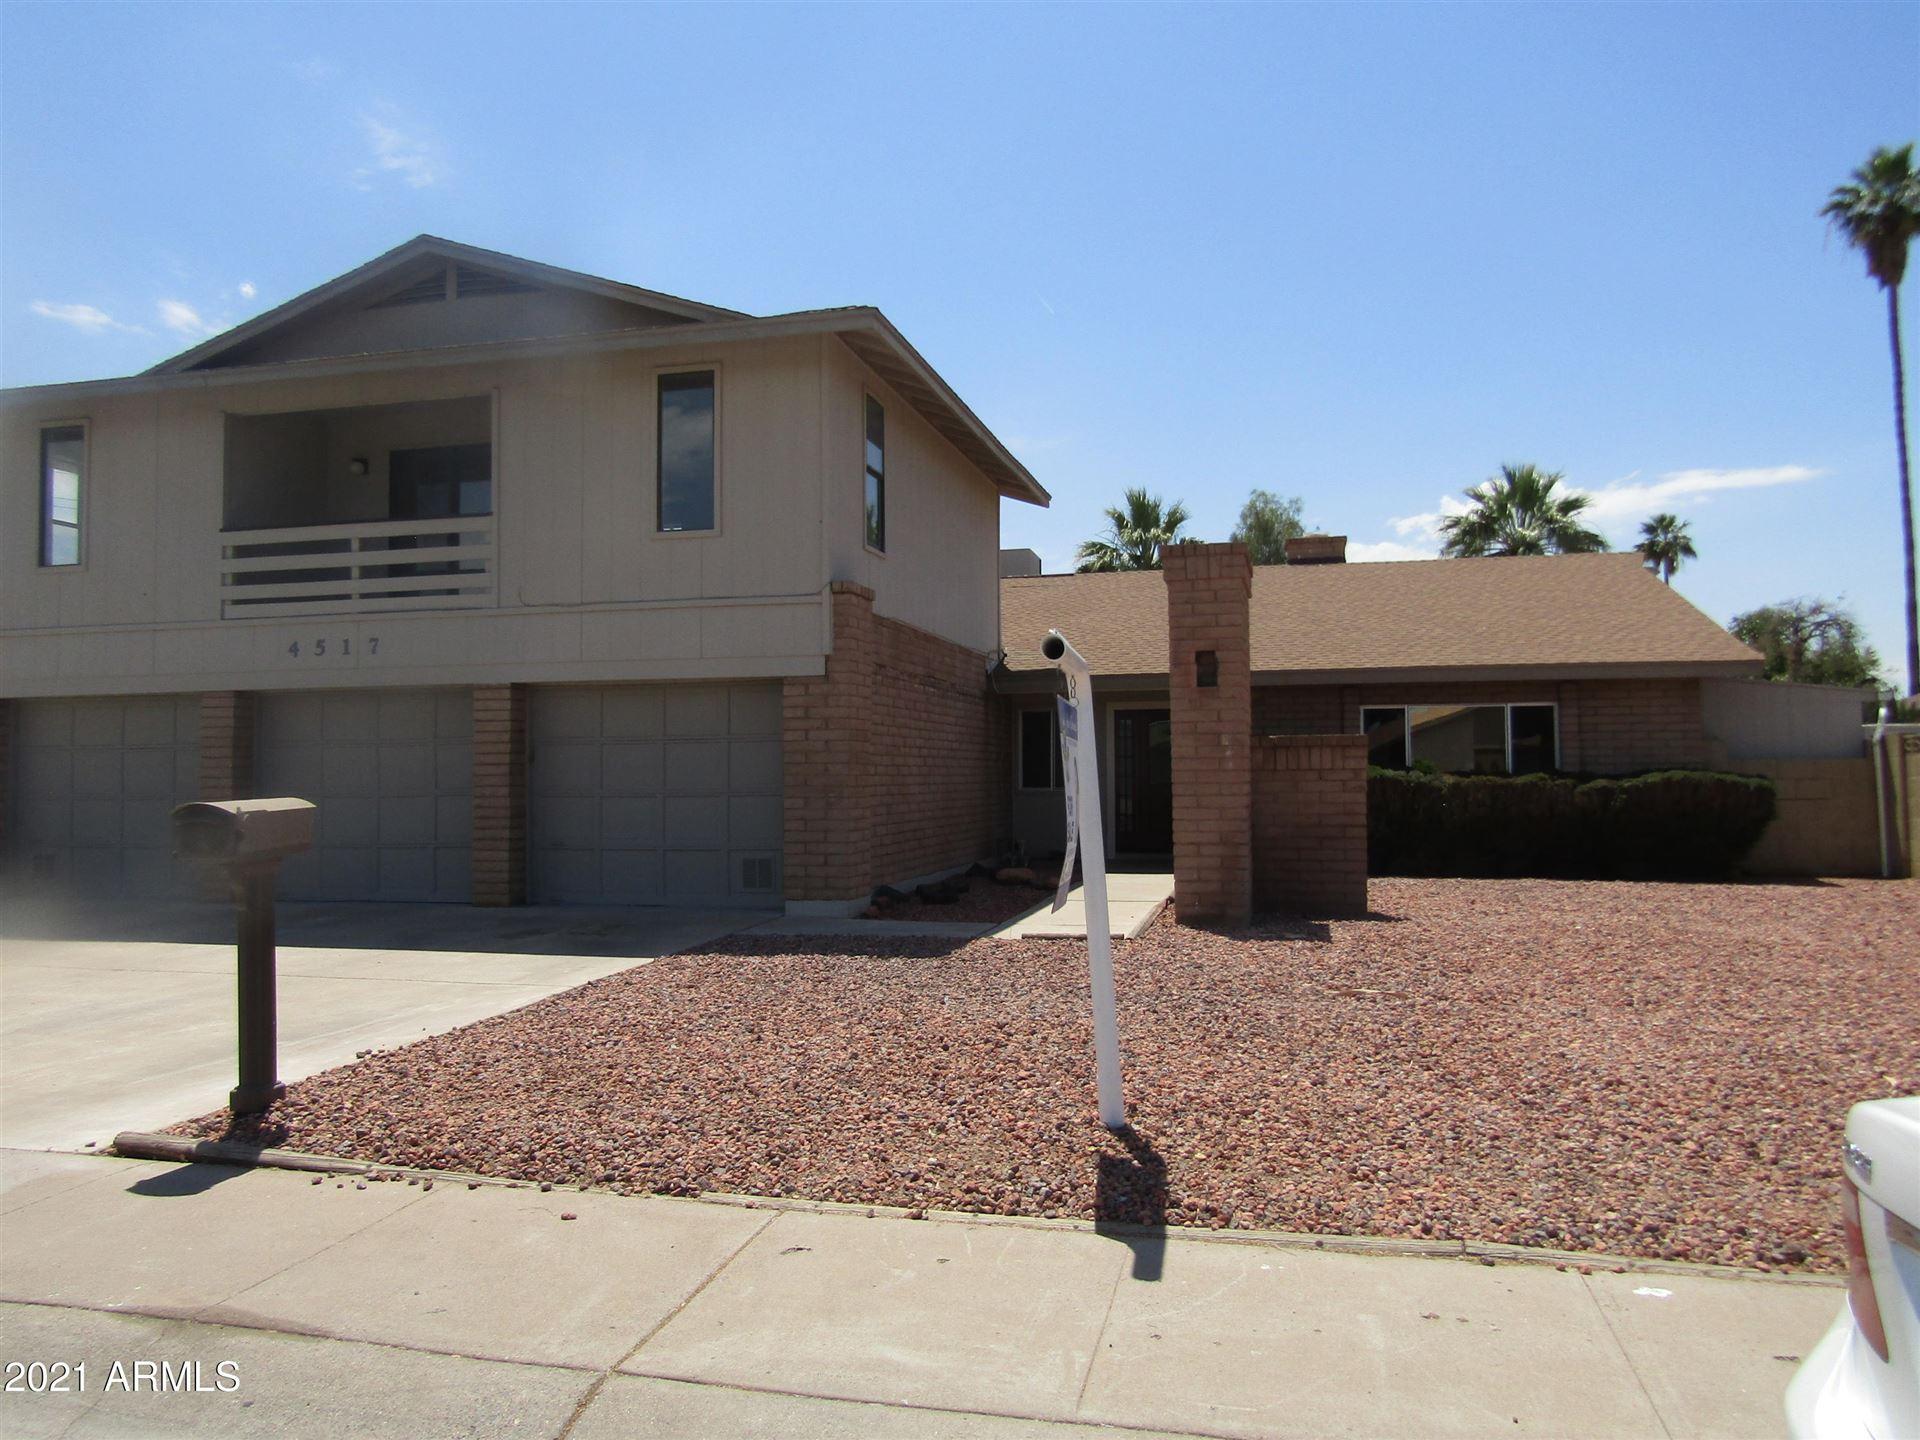 4517 W FRIER Drive, Glendale, AZ 85301 - MLS#: 6229825